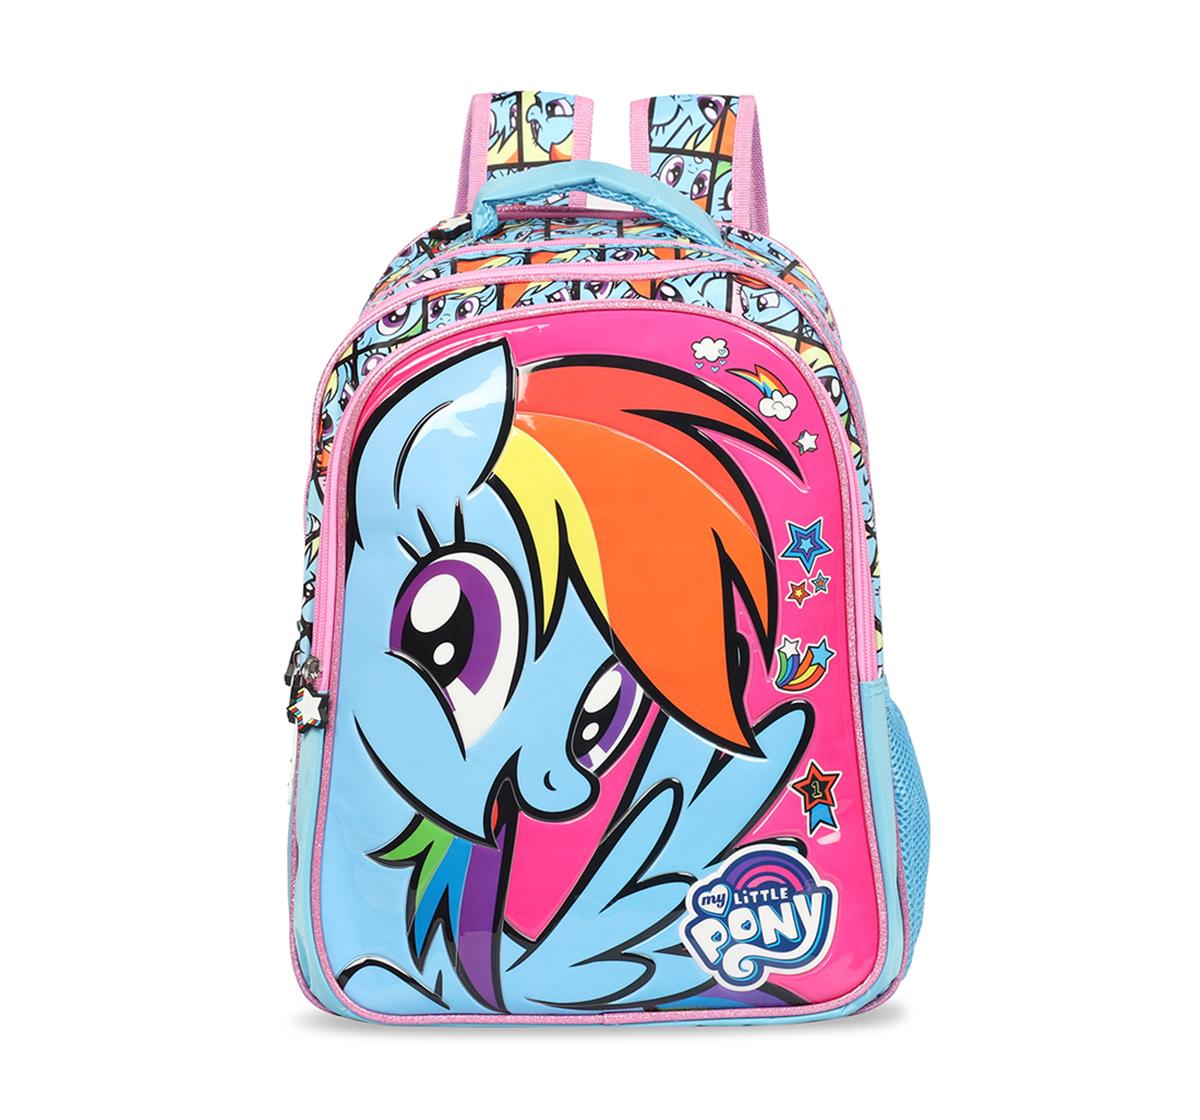 My Little Pony | My Little Pony My Little Pony Hood School Bag 41 Cm Bags for Girls age 7Y+